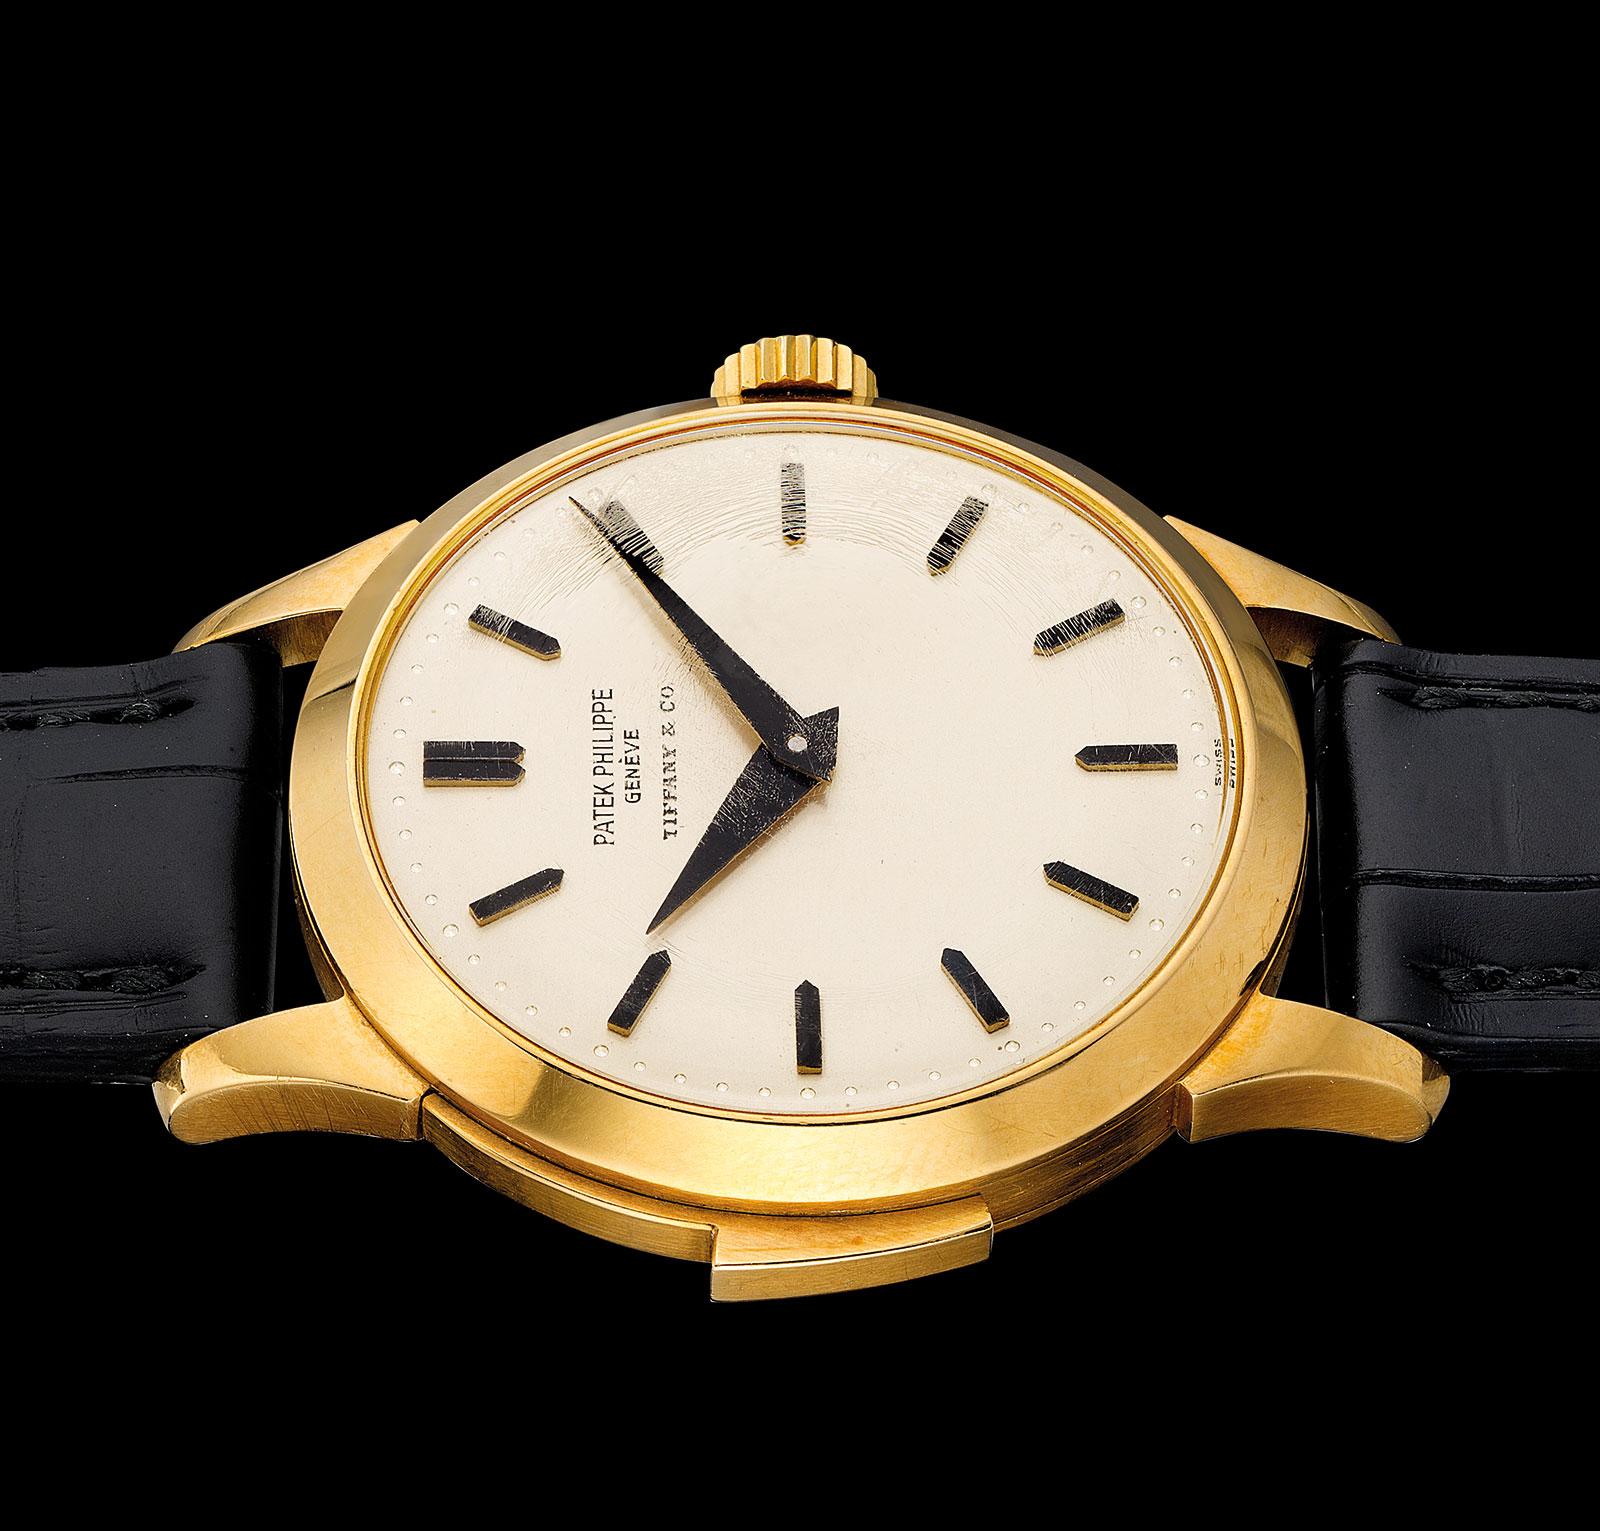 Patek Philippe 2524 minute repeater Tiffany profile